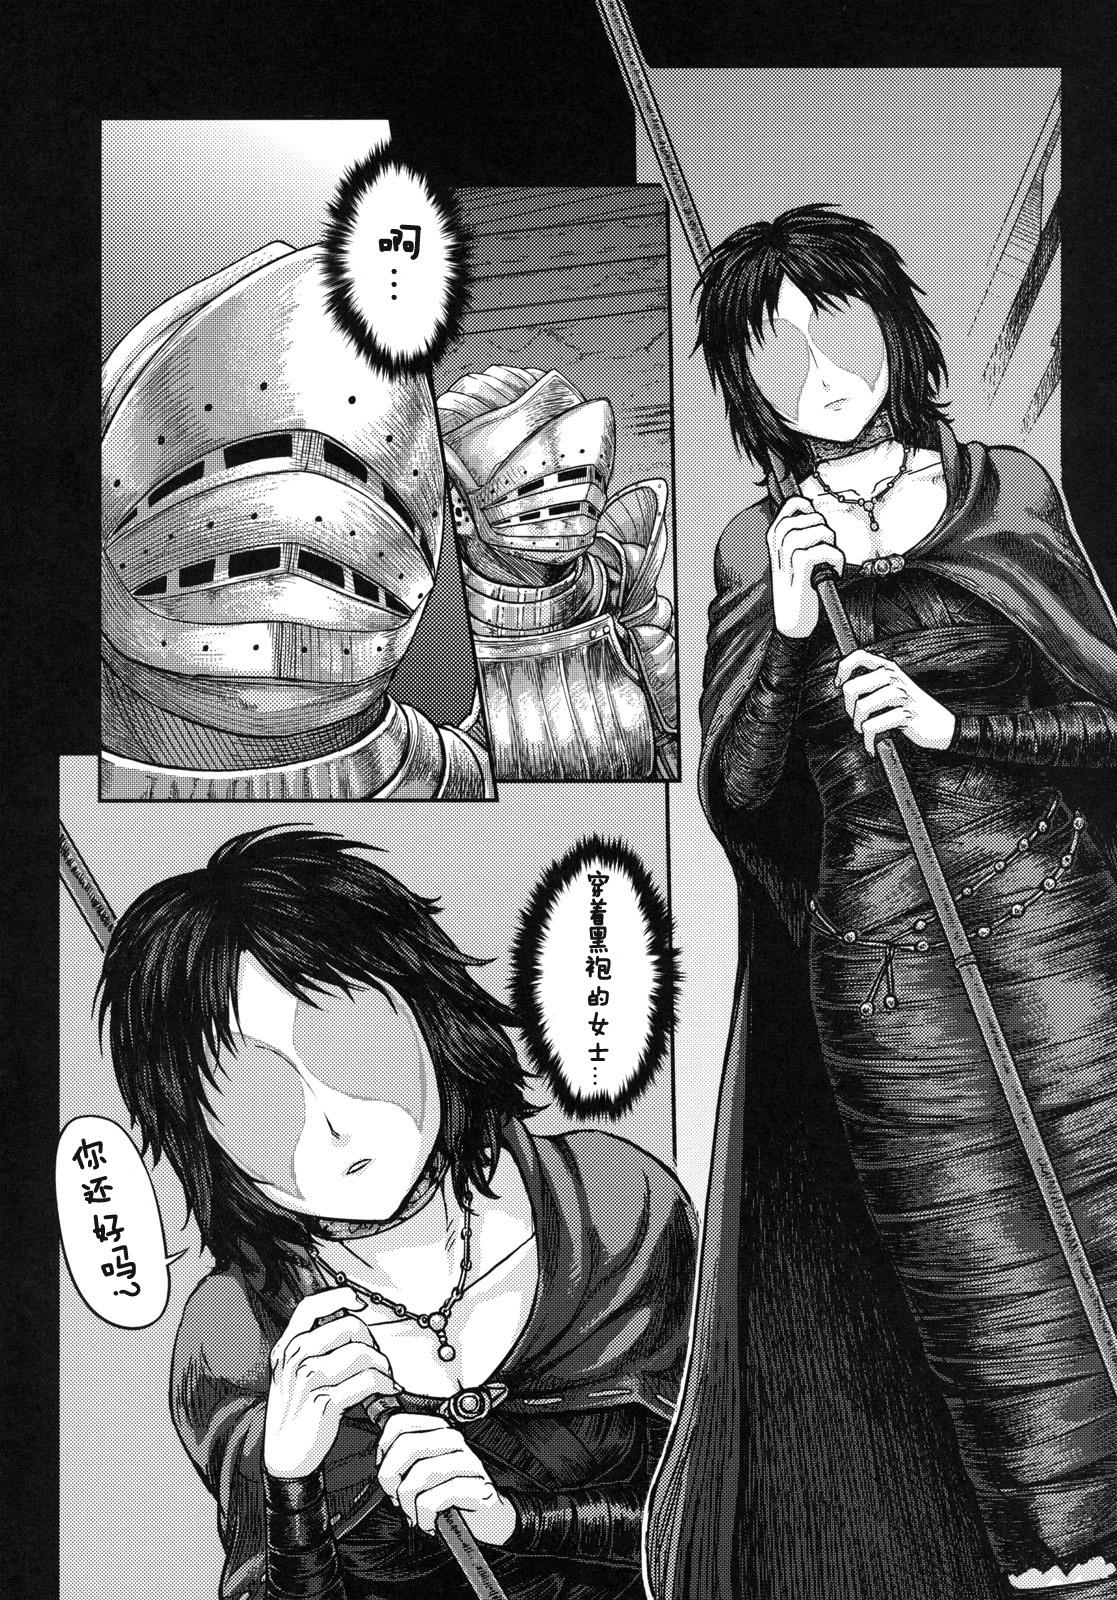 Kono Saki, Ashi ni Chuuishiro | Be Wary of Feet Ahead 3